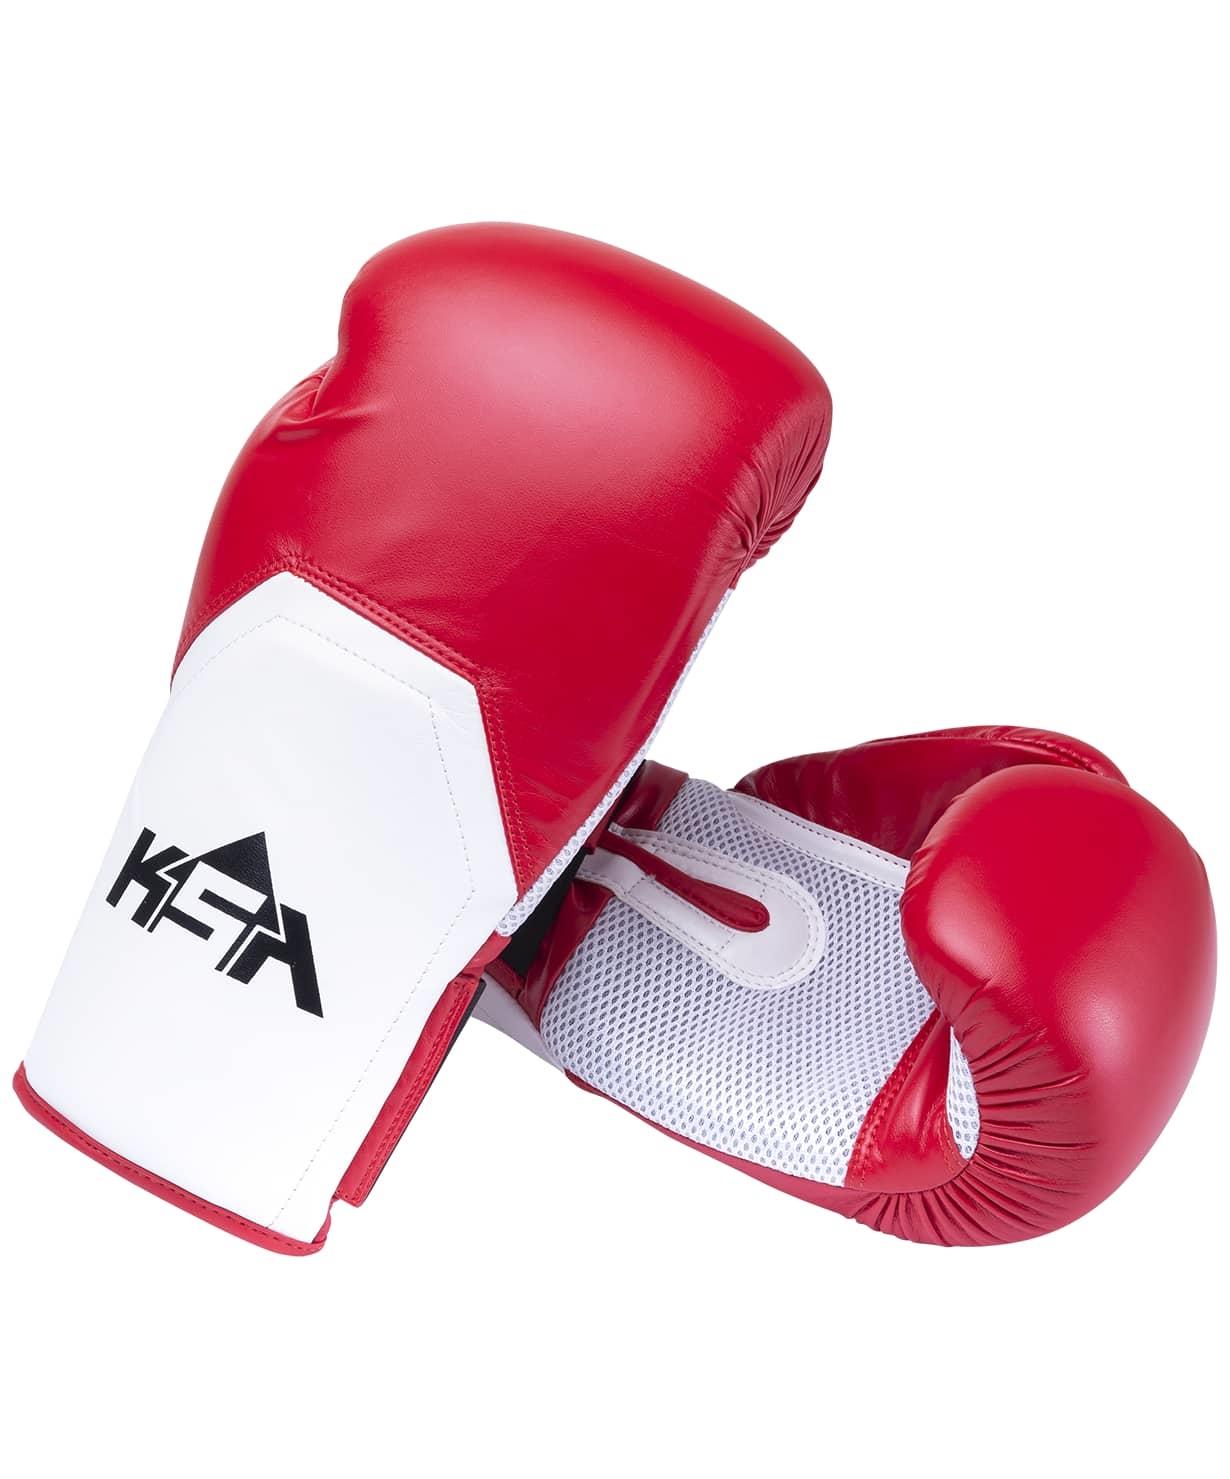 Перчатки боксерские Scorpio Red, к/з, 12 oz